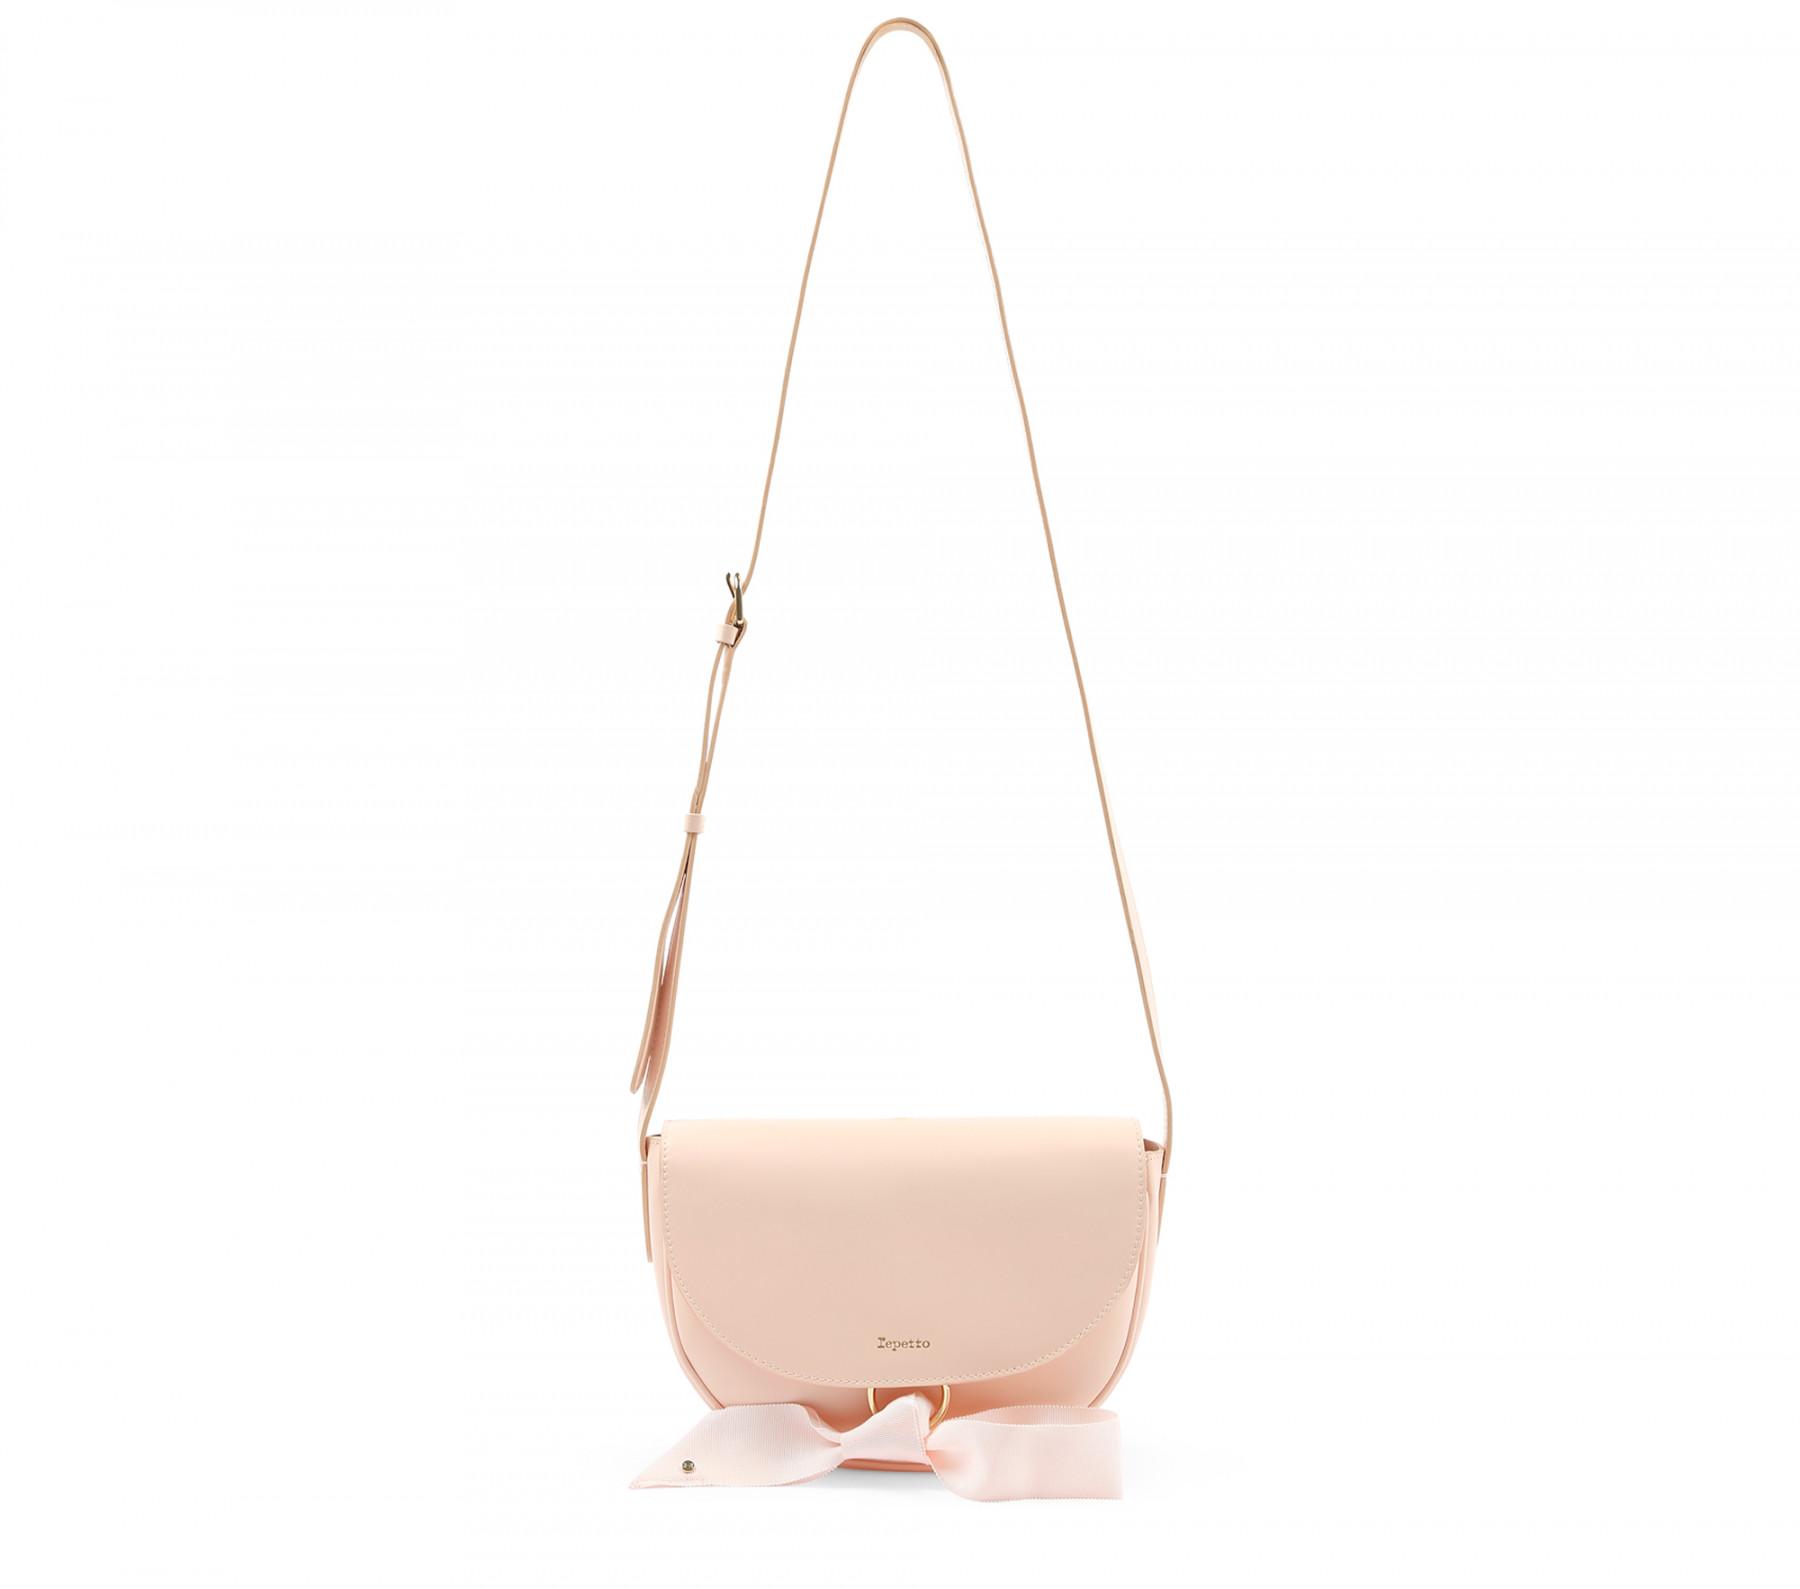 Duo small bag